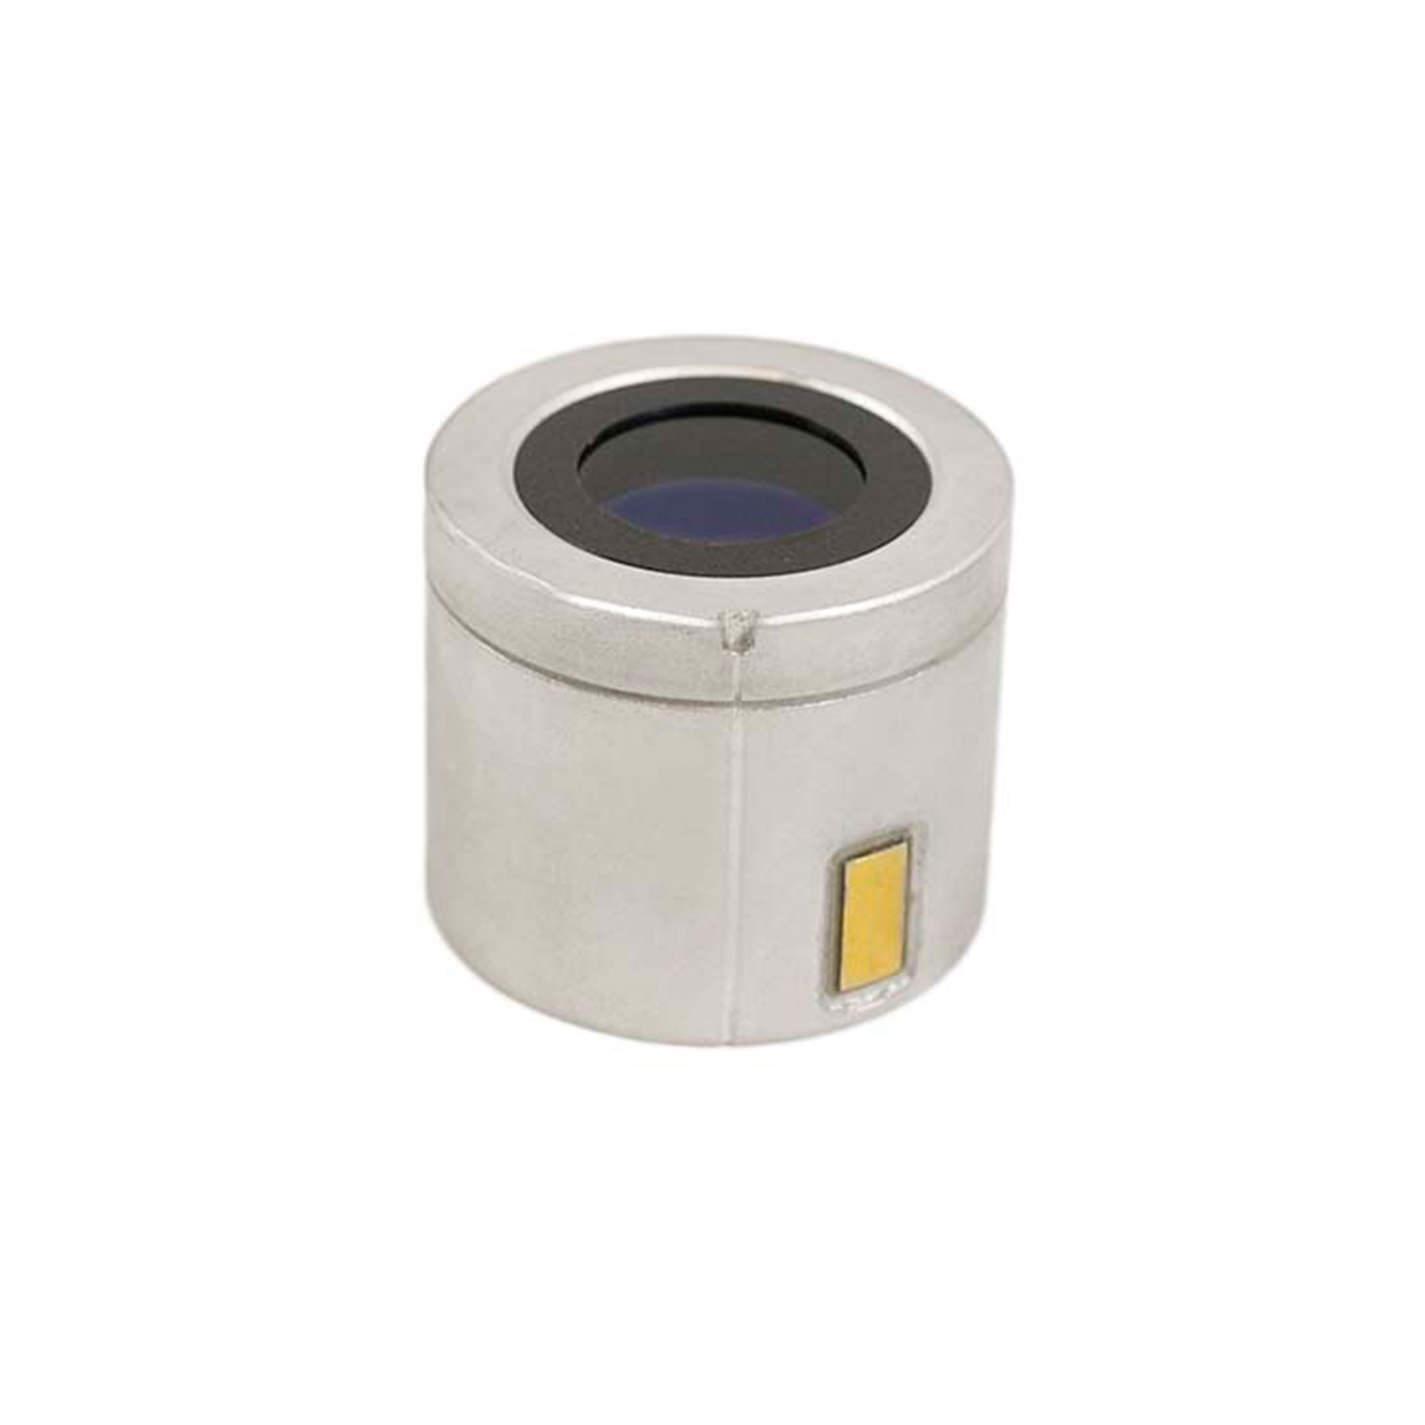 MX10160 Image Intensifier Tube